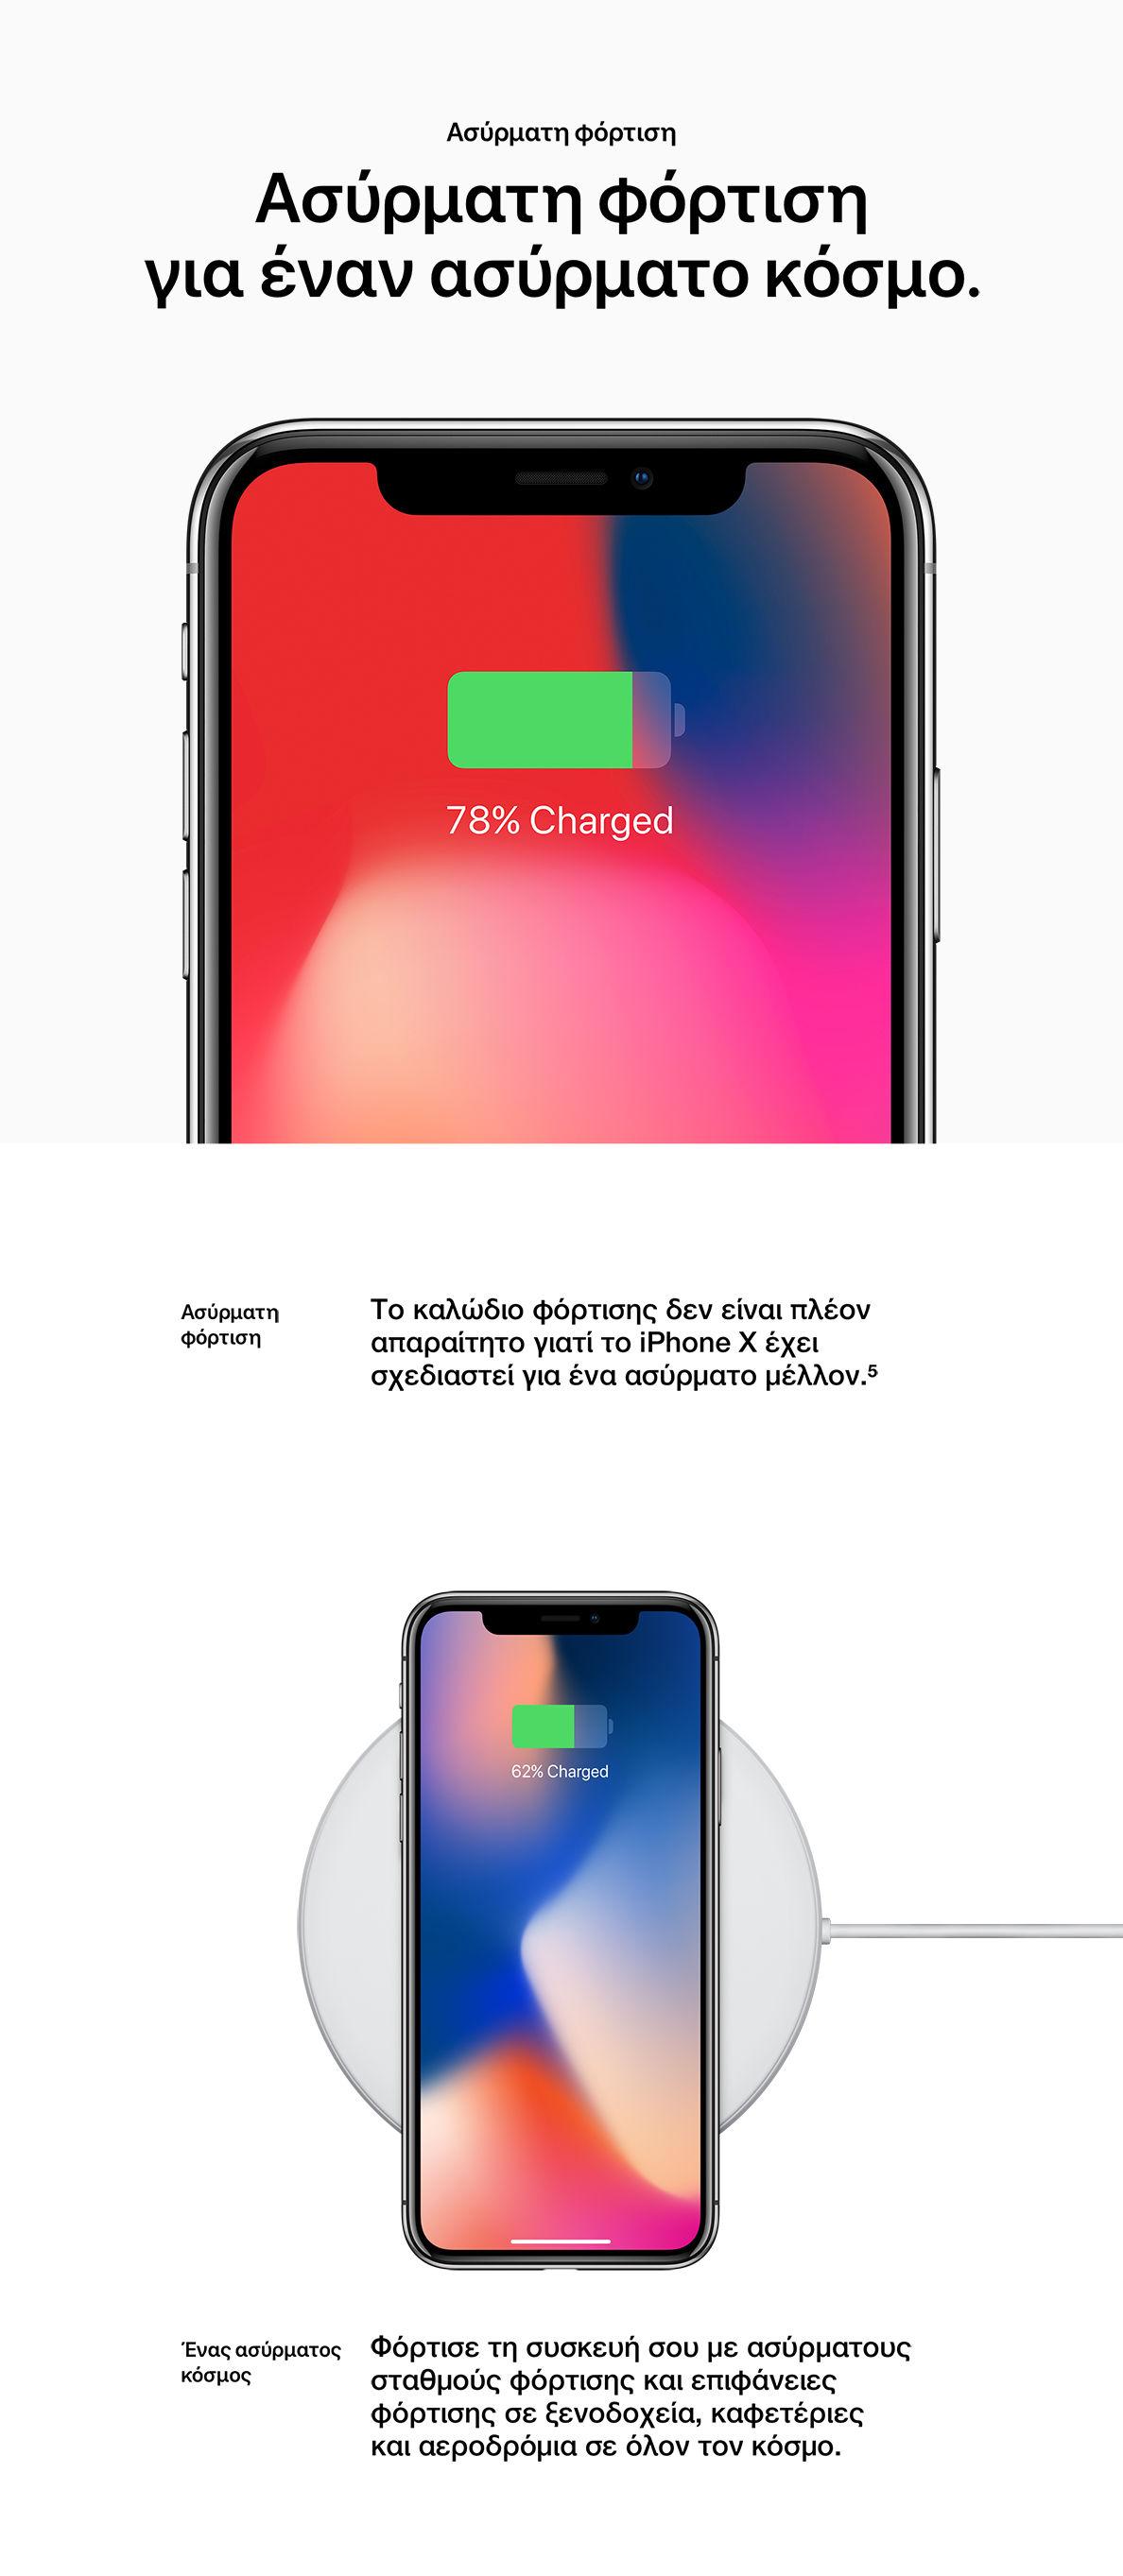 iPhonex-agora-Ellada-Mediamarkt-public-kotsovolos-germanos-iPhoneX-diathesimo-gia-paraggelia-november-2017 (13)